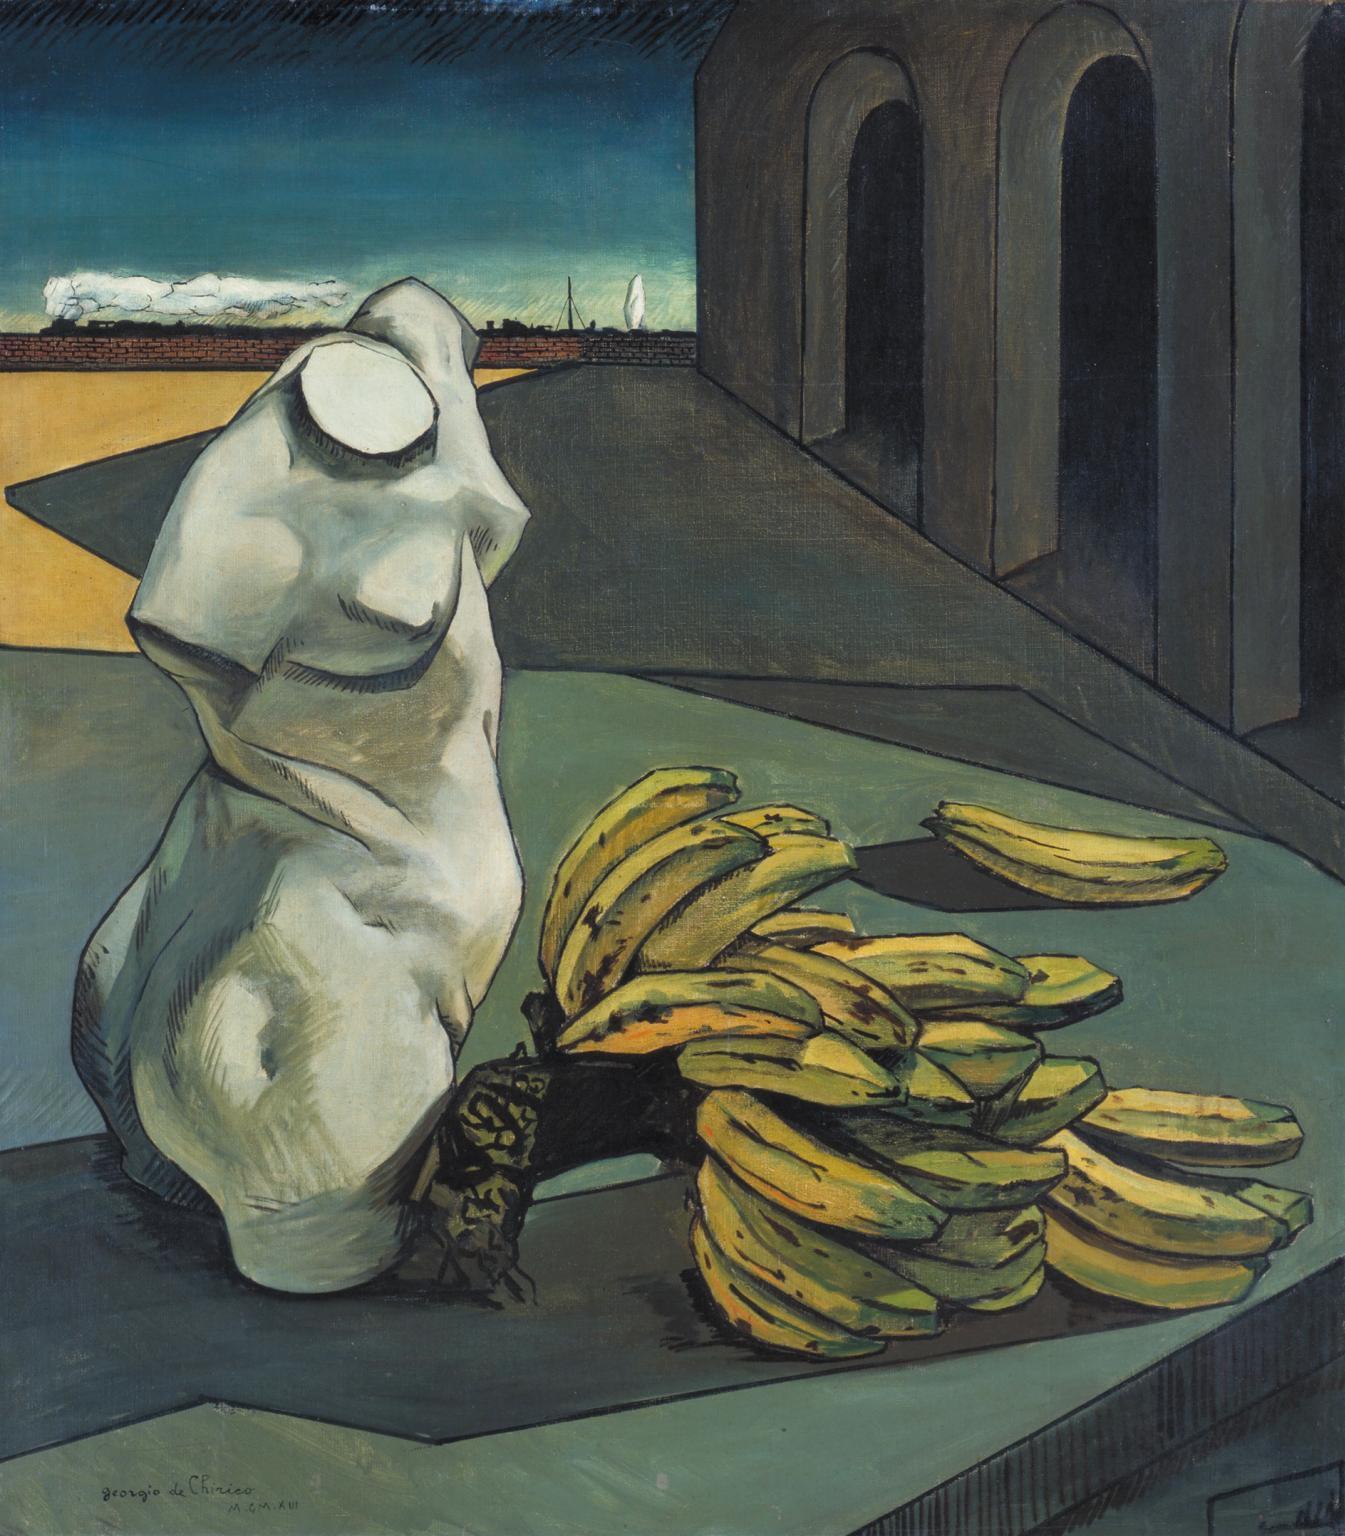 Giorgio de Chirico, The Uncertainty of the Poet Surrealism